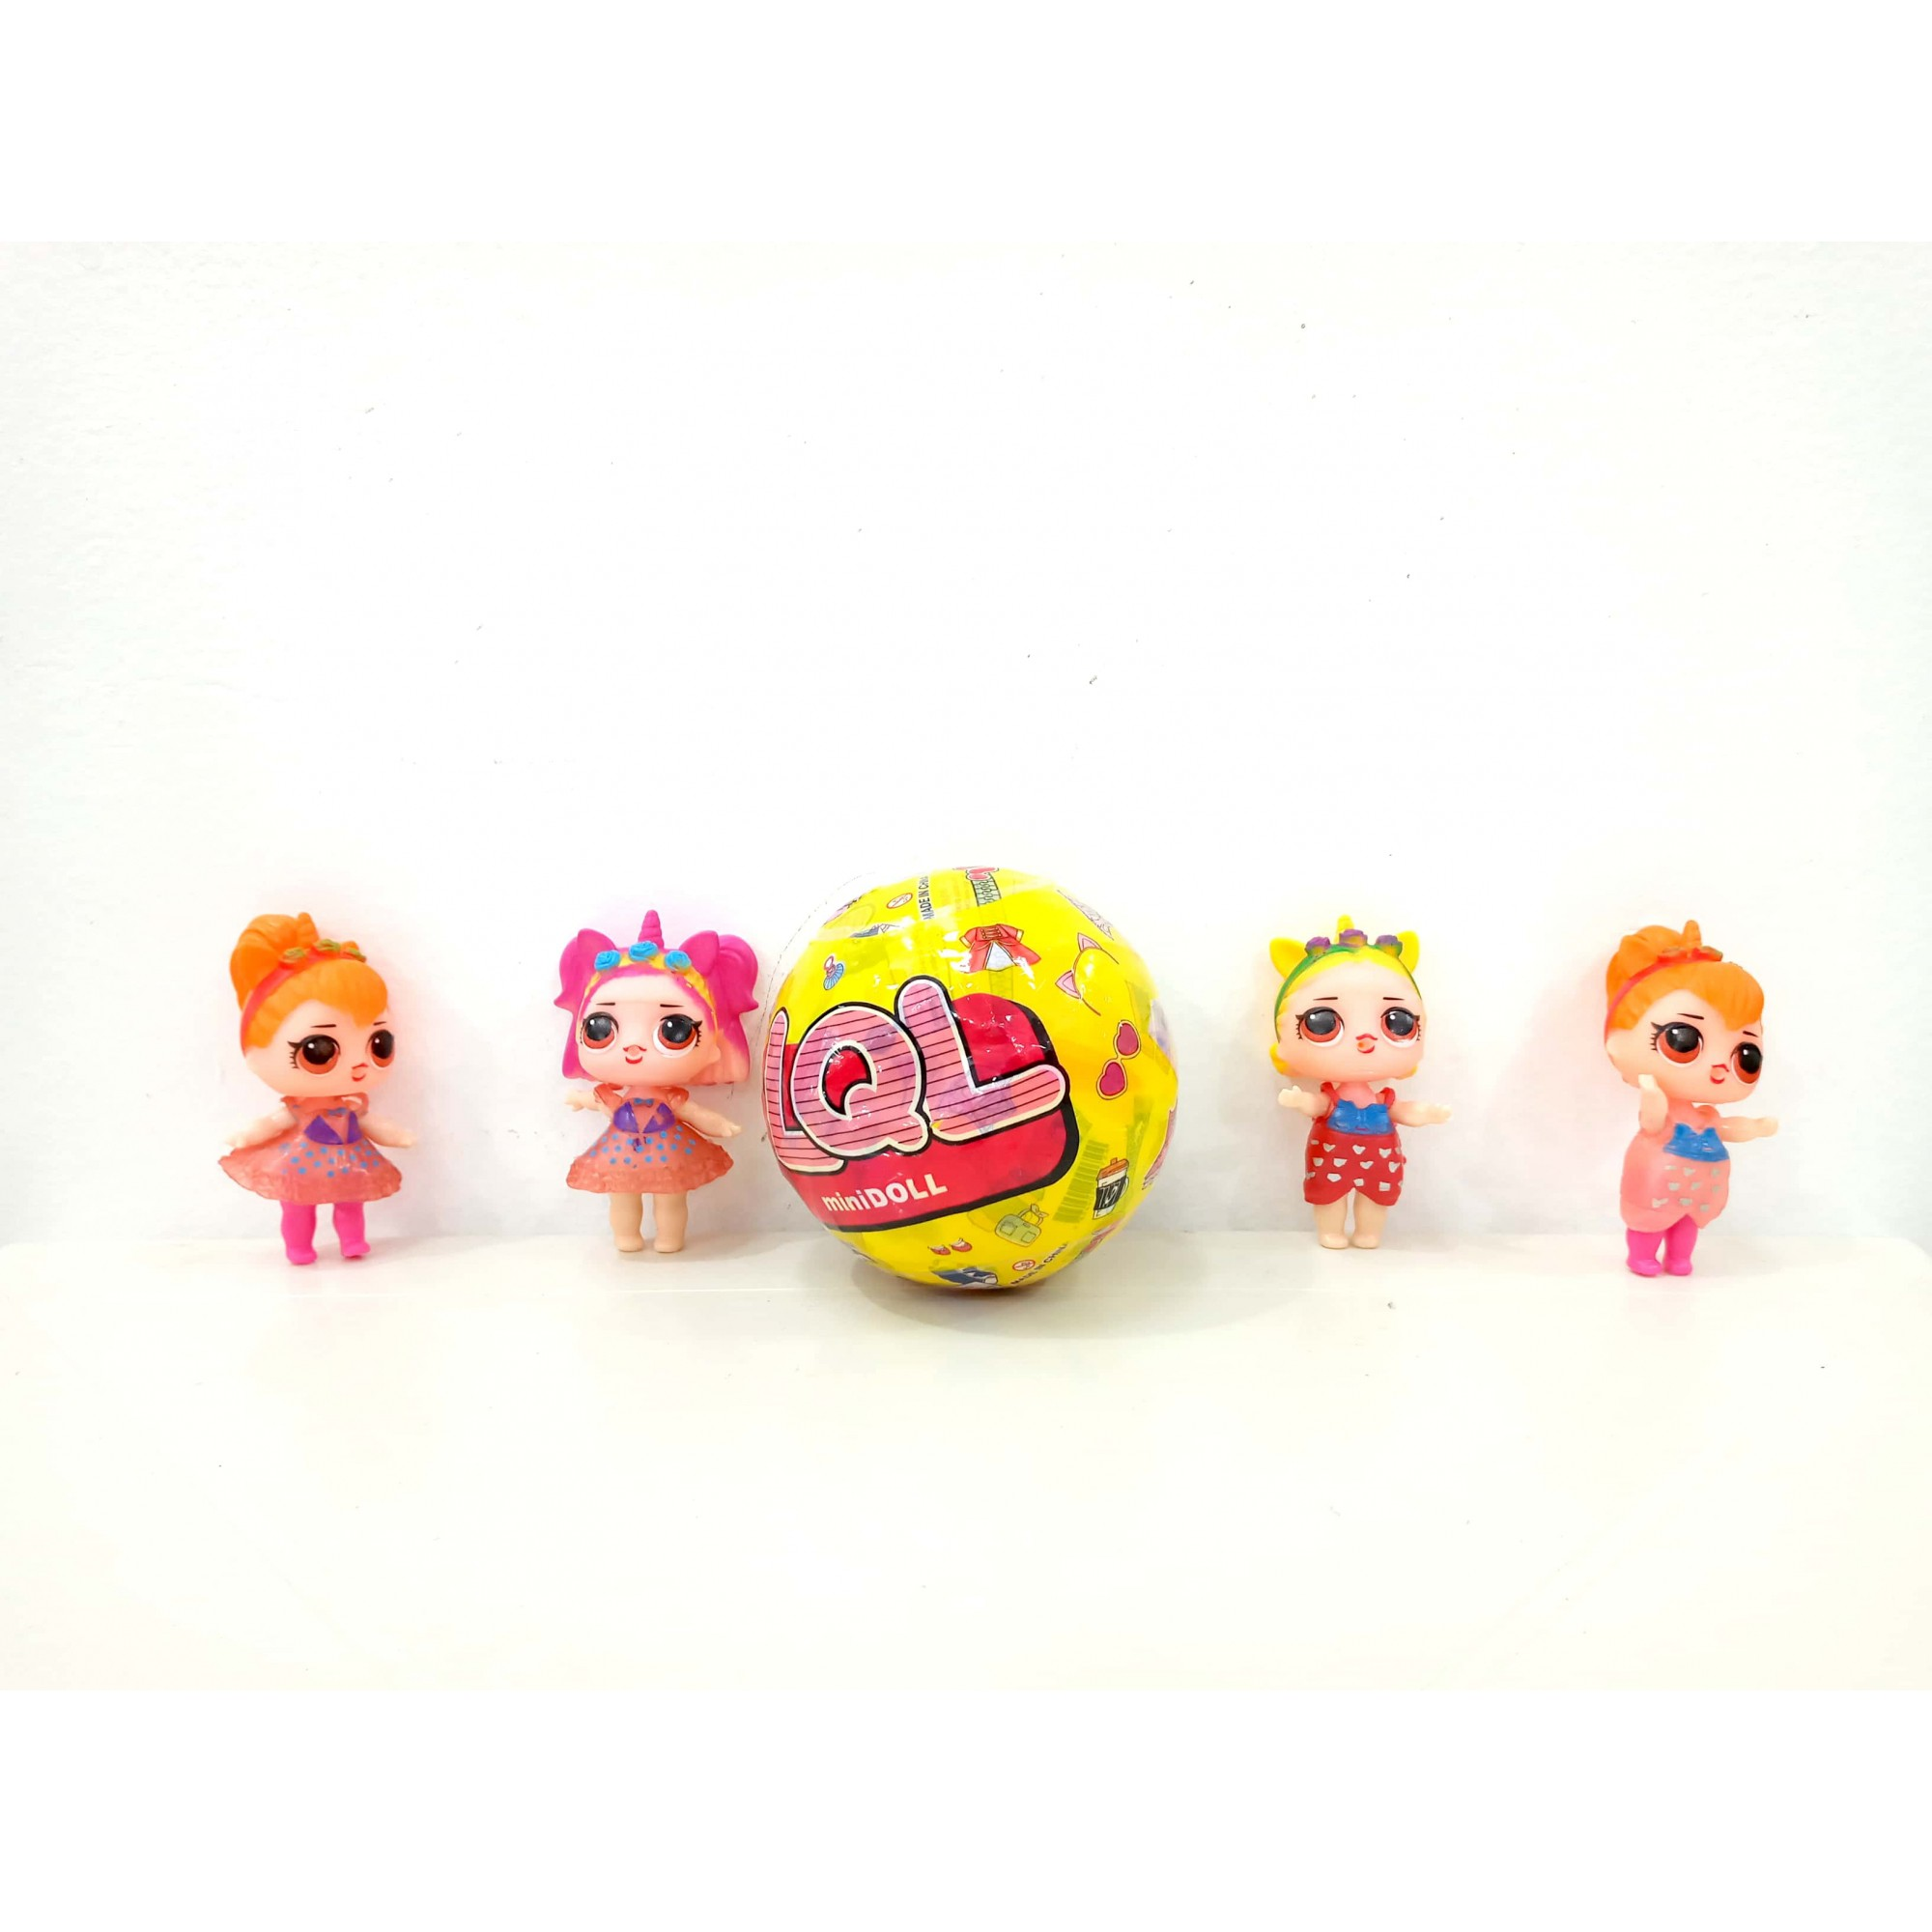 Bonecos  Mini Doll Lol Surprise - 6449